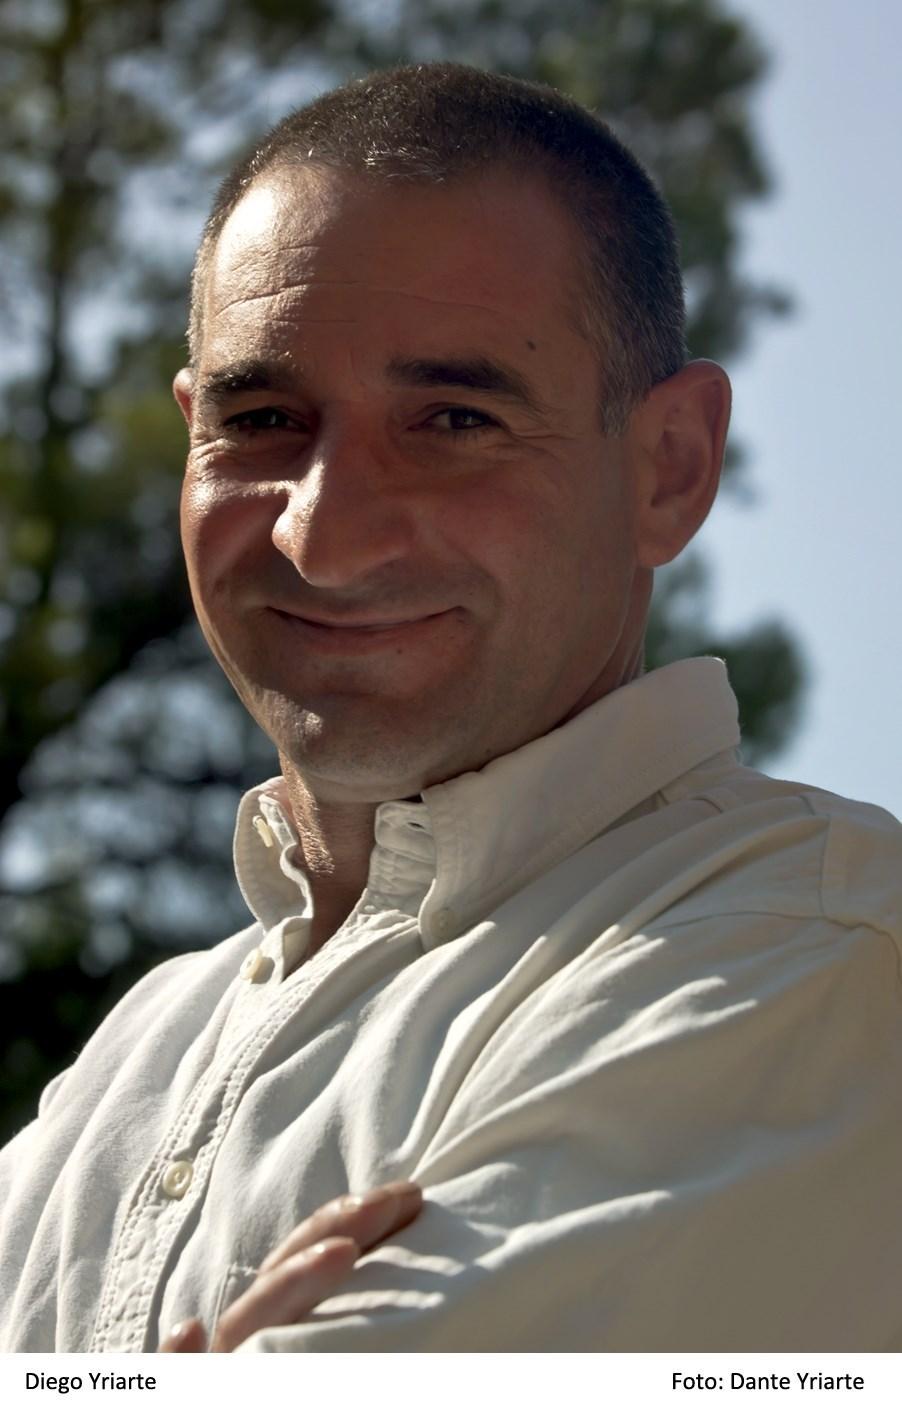 Diego Yriarte